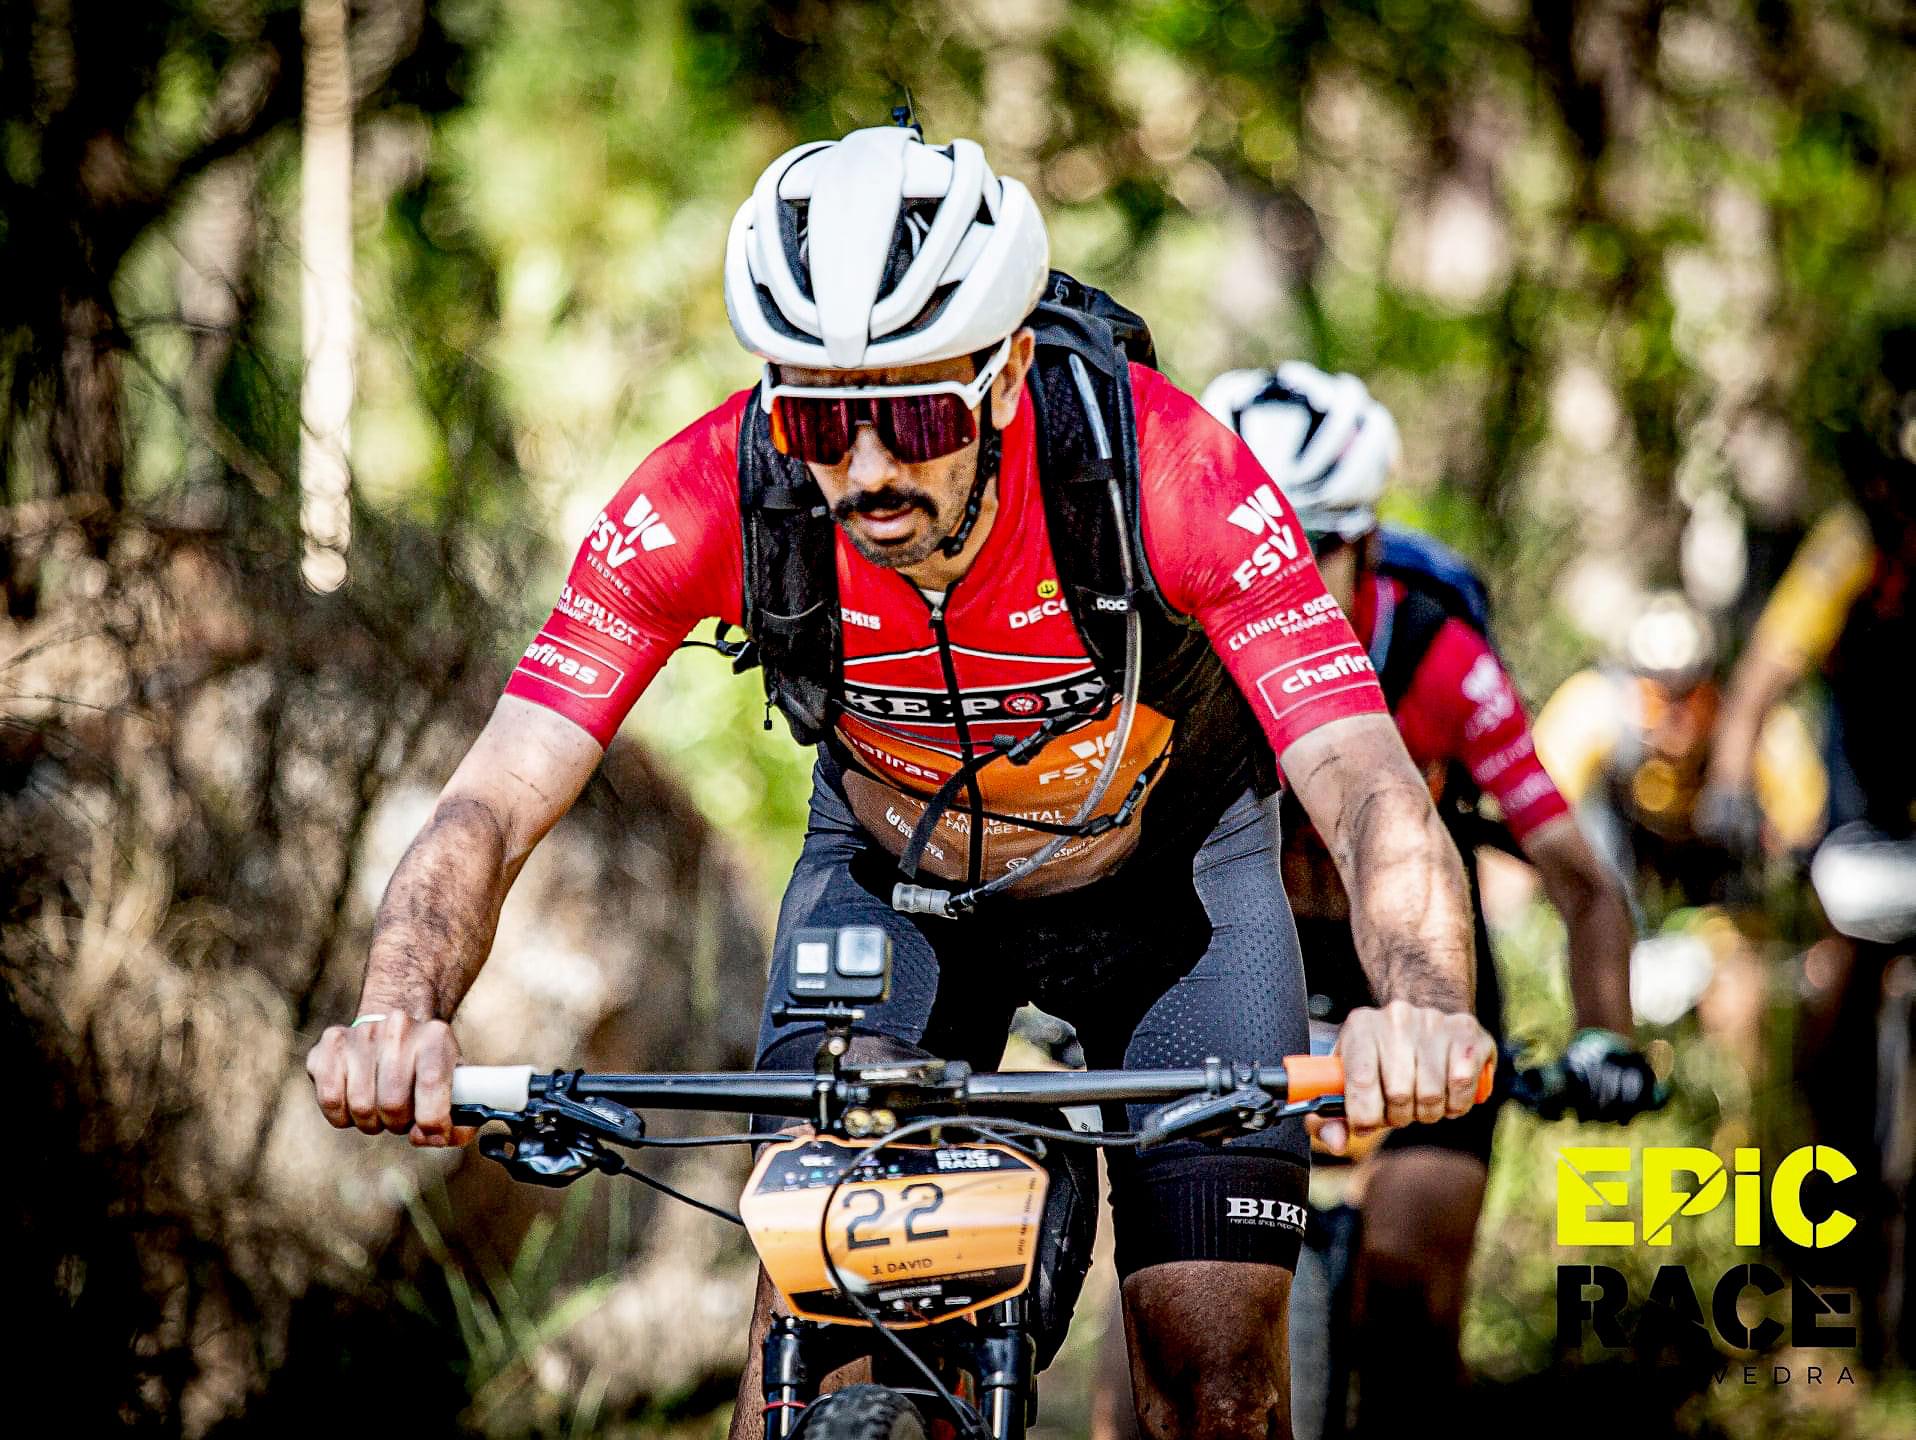 David Mtb Bike Point Tenerife Bike Hire & Bike Rental